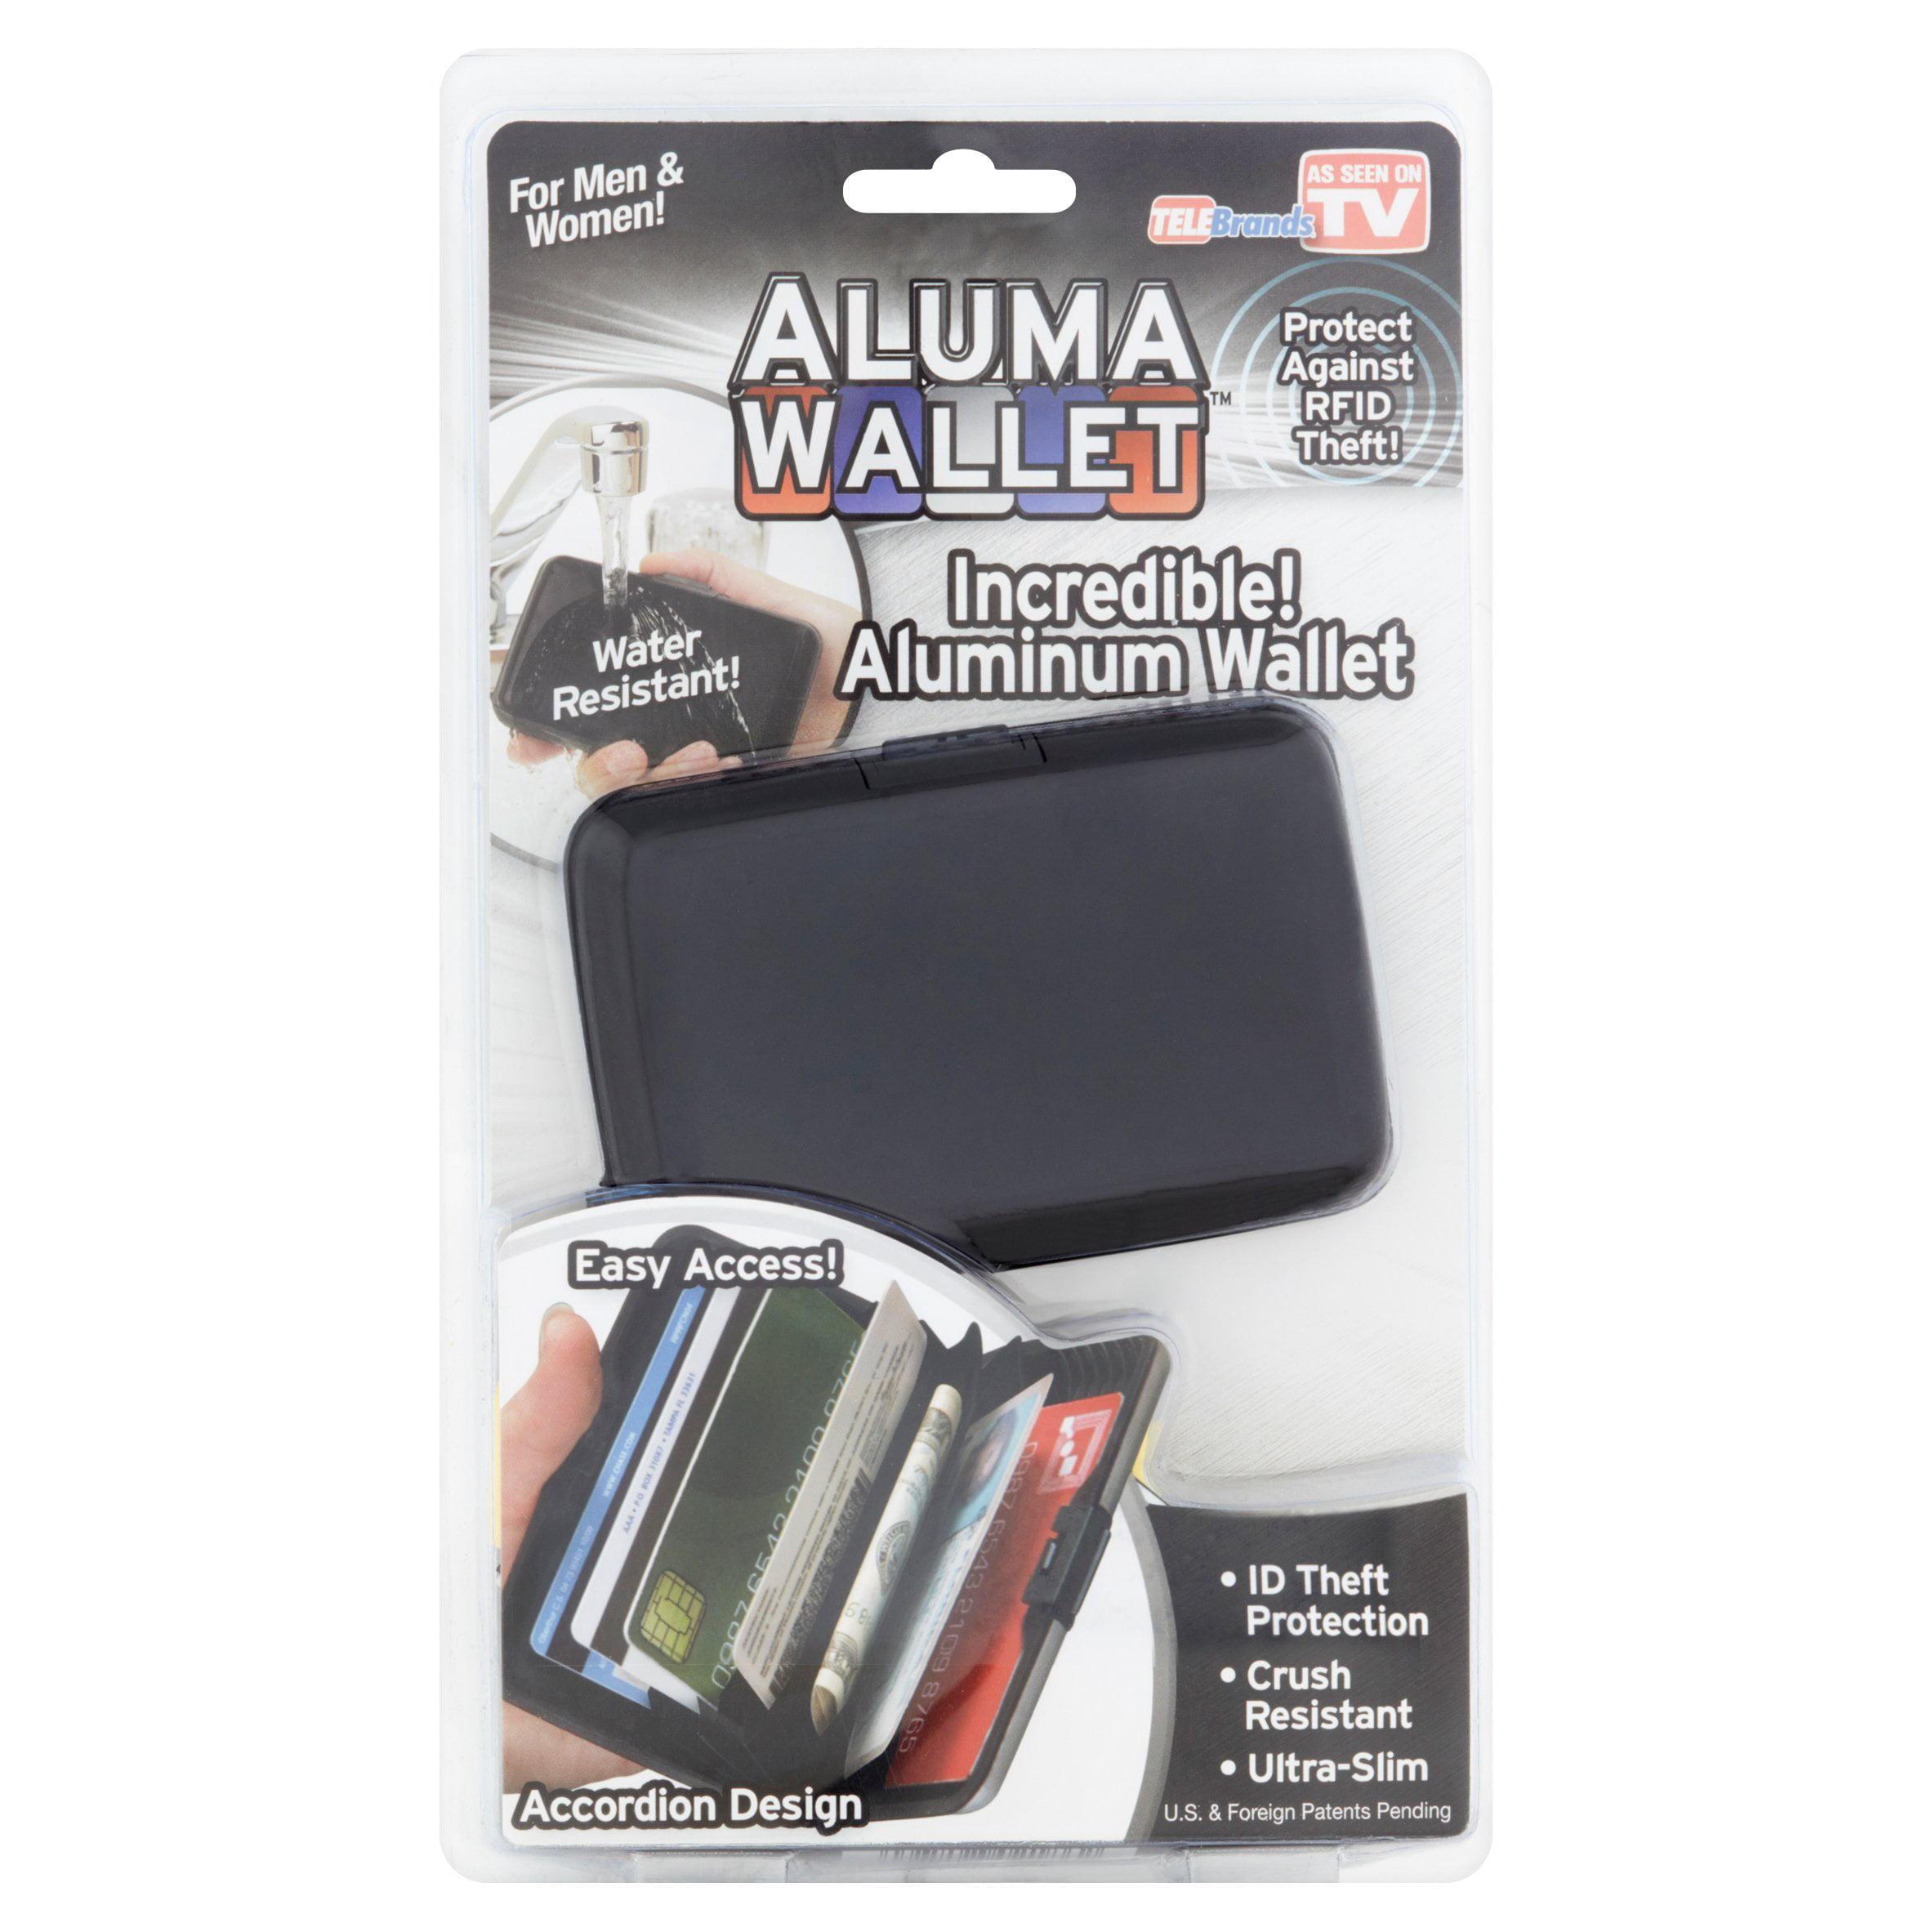 Aluma Aluminum Wallet for Men & Women